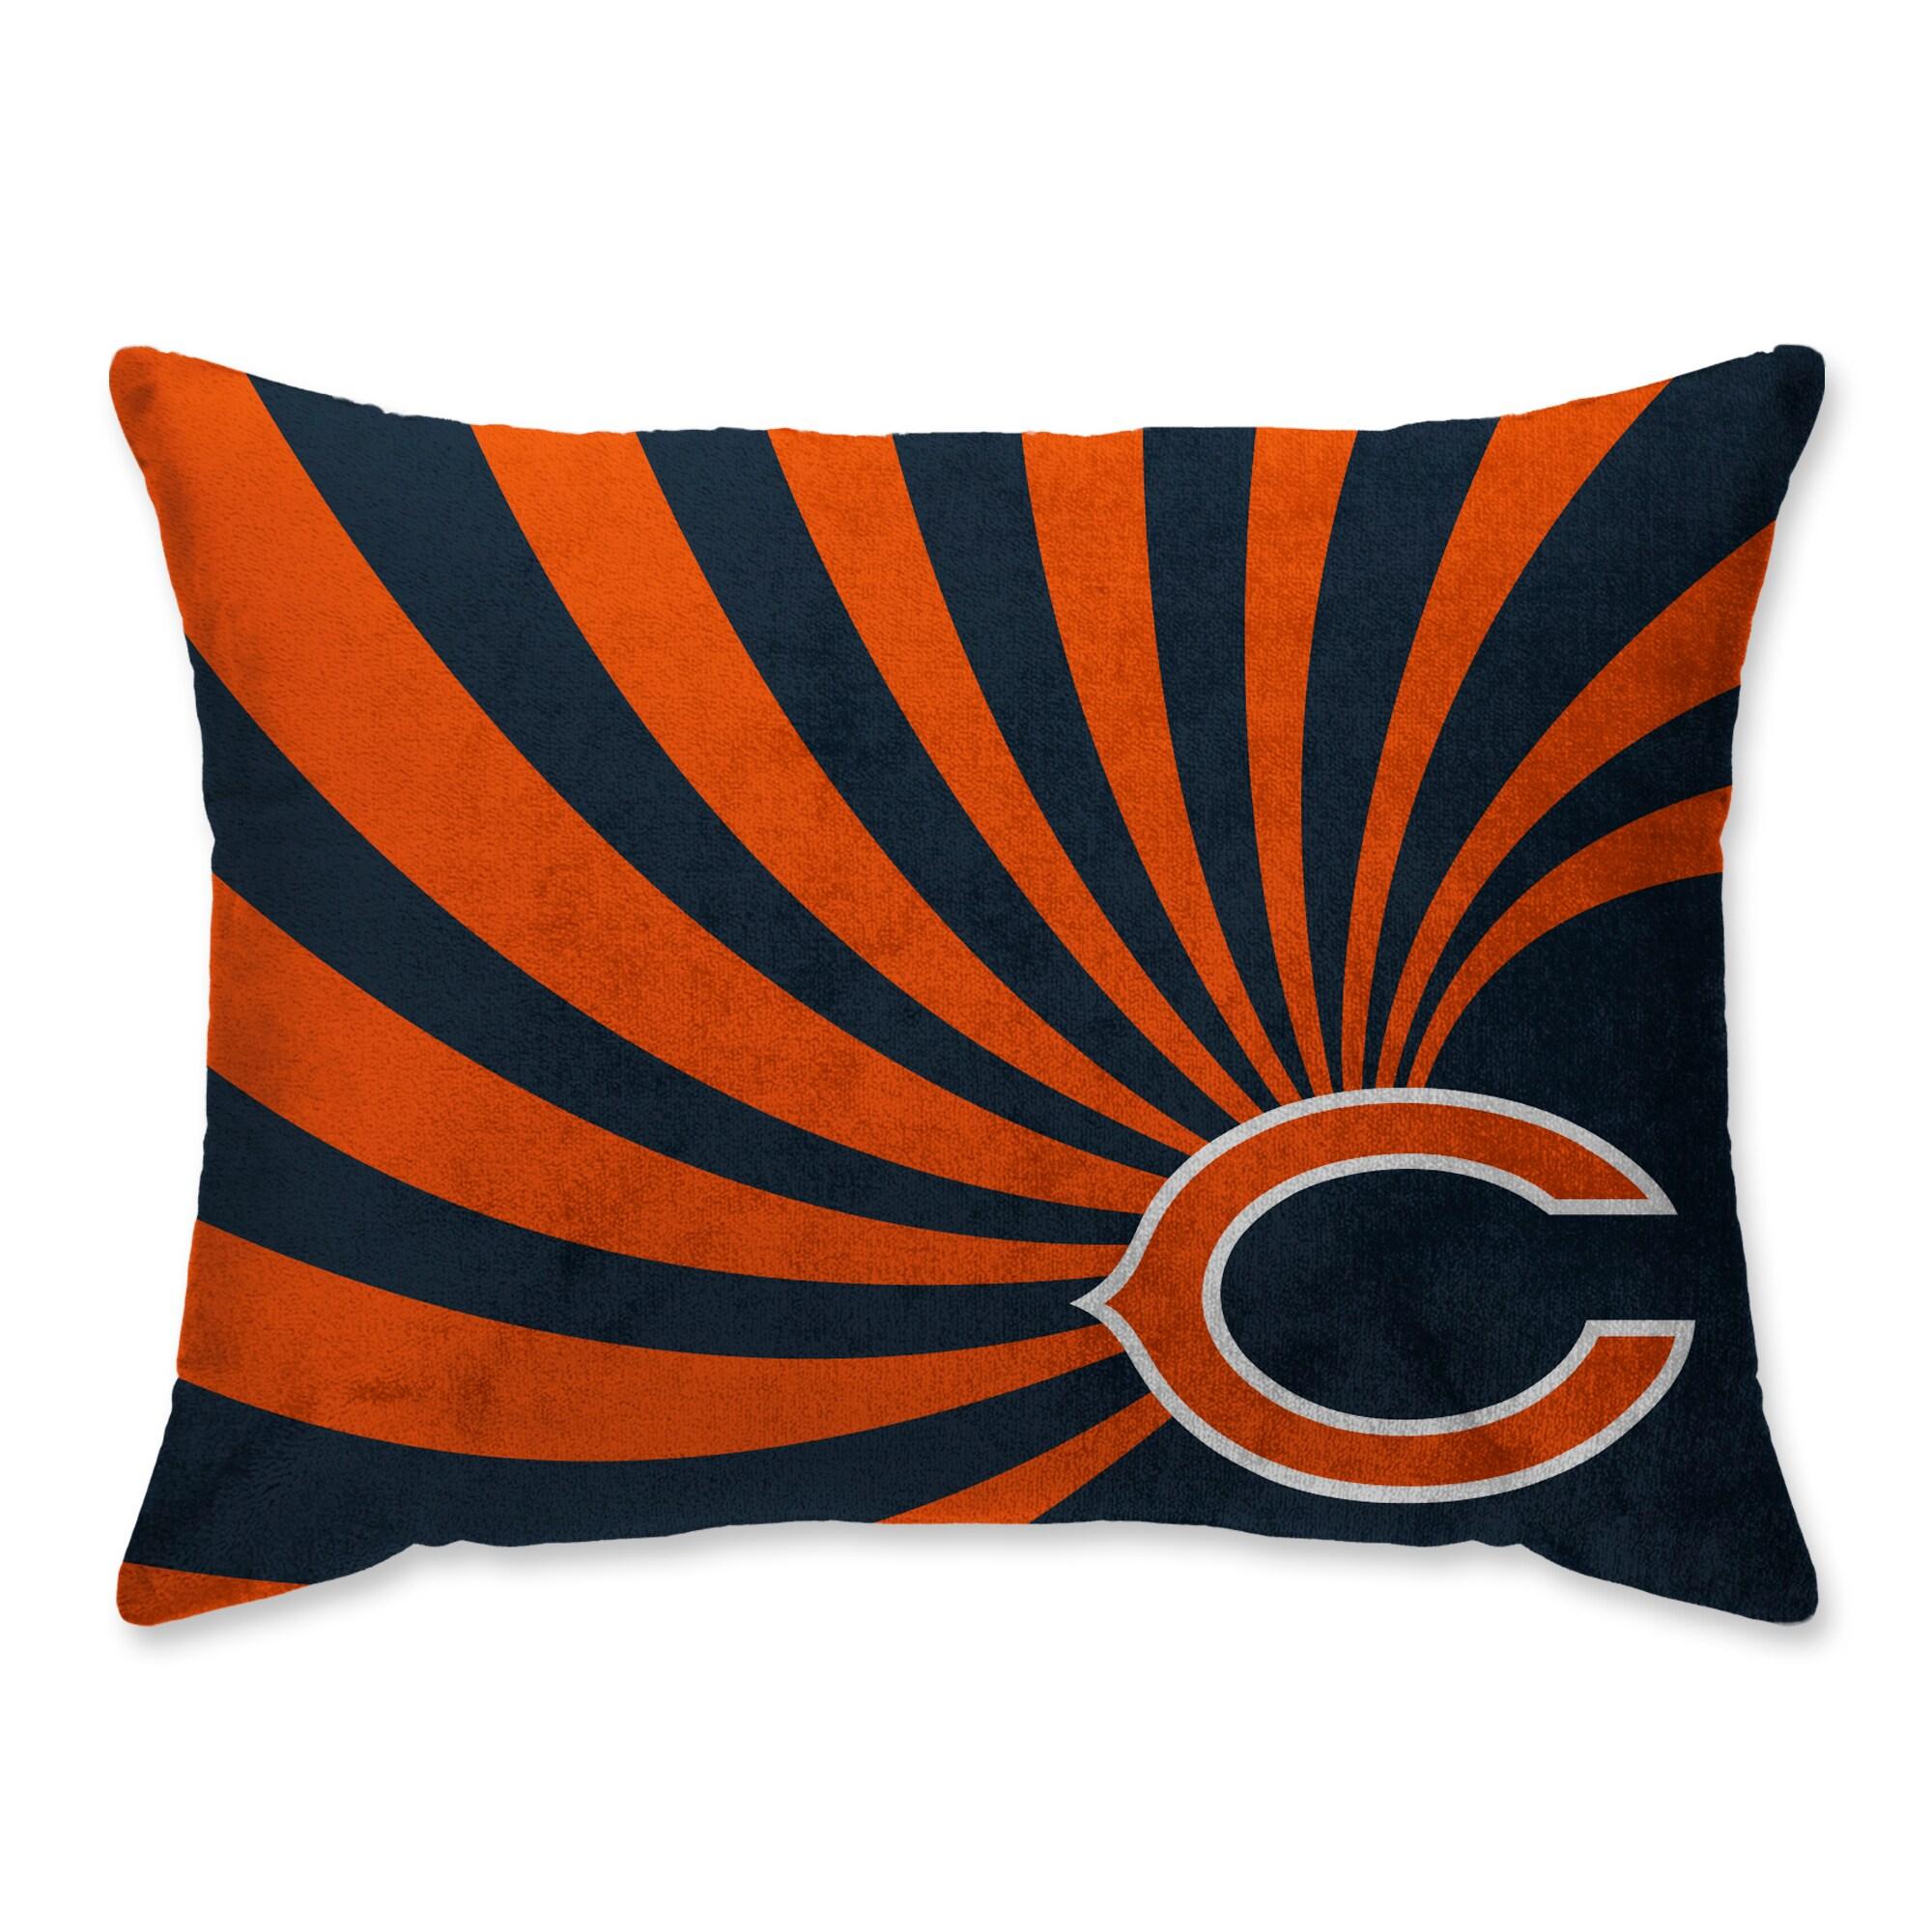 Chicago Bears Super Plush Mink Wave Bed Pillow - Blue